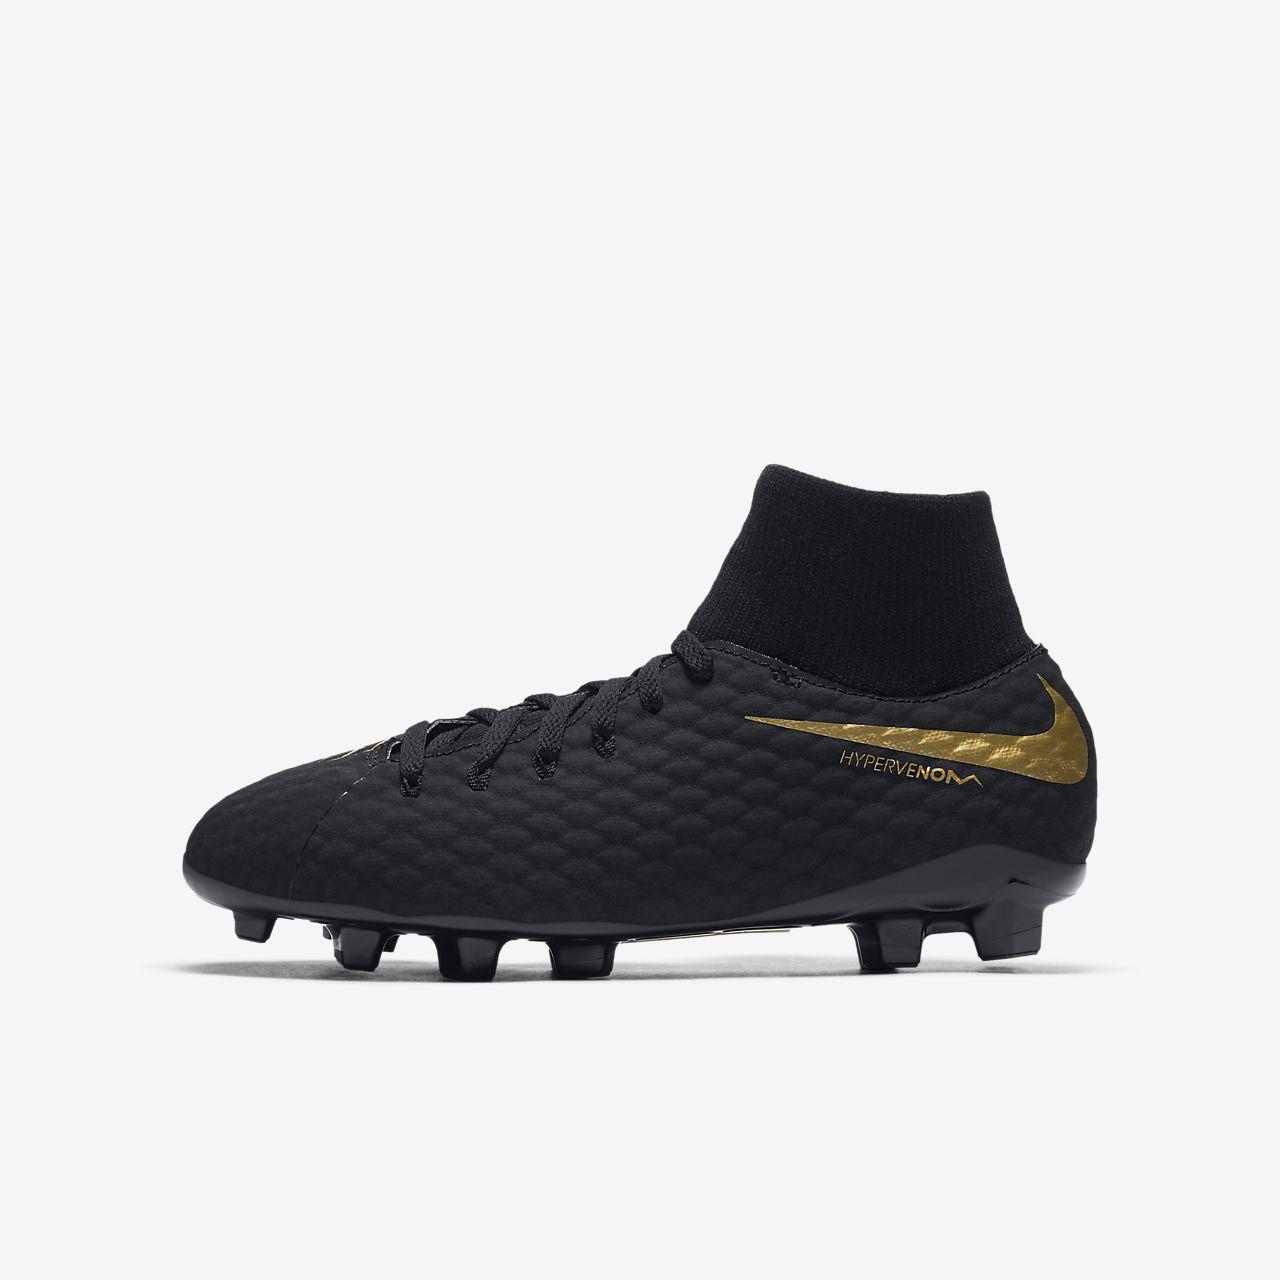 Nike junior phantom 3 academy fg - Scarpe da calcio Entrega Rápida Espacio Libre 100% Originales Venta 100% Garantizado Venta Barata 2018 WjqhIYYHX